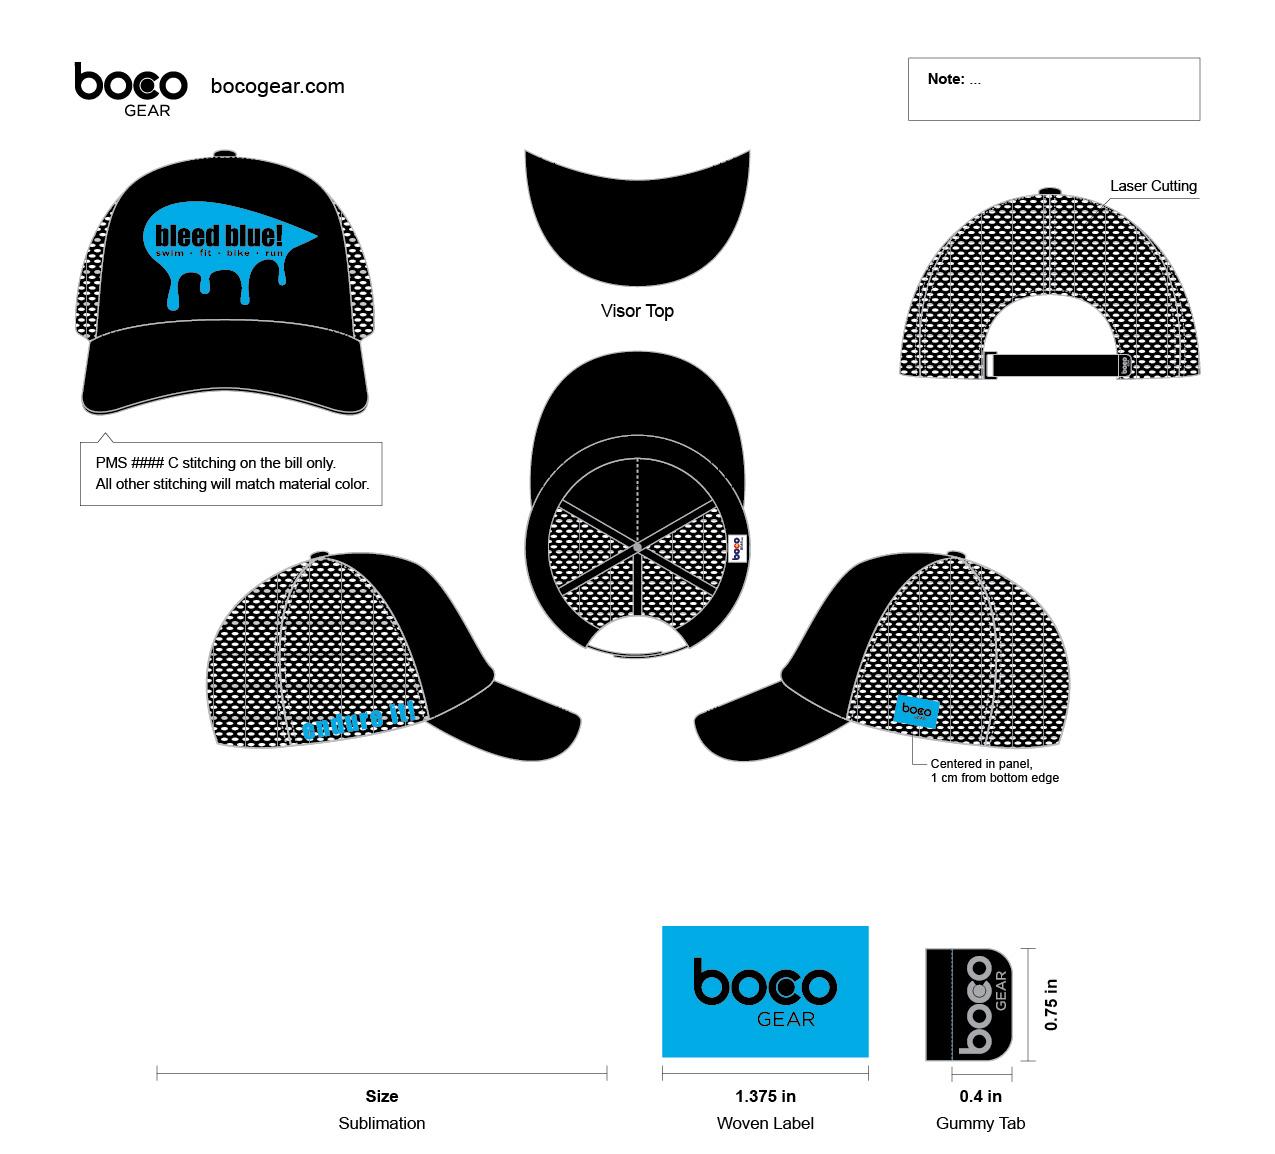 Boco Trucker hat_Endure it_Bleed Bue-01.jpg